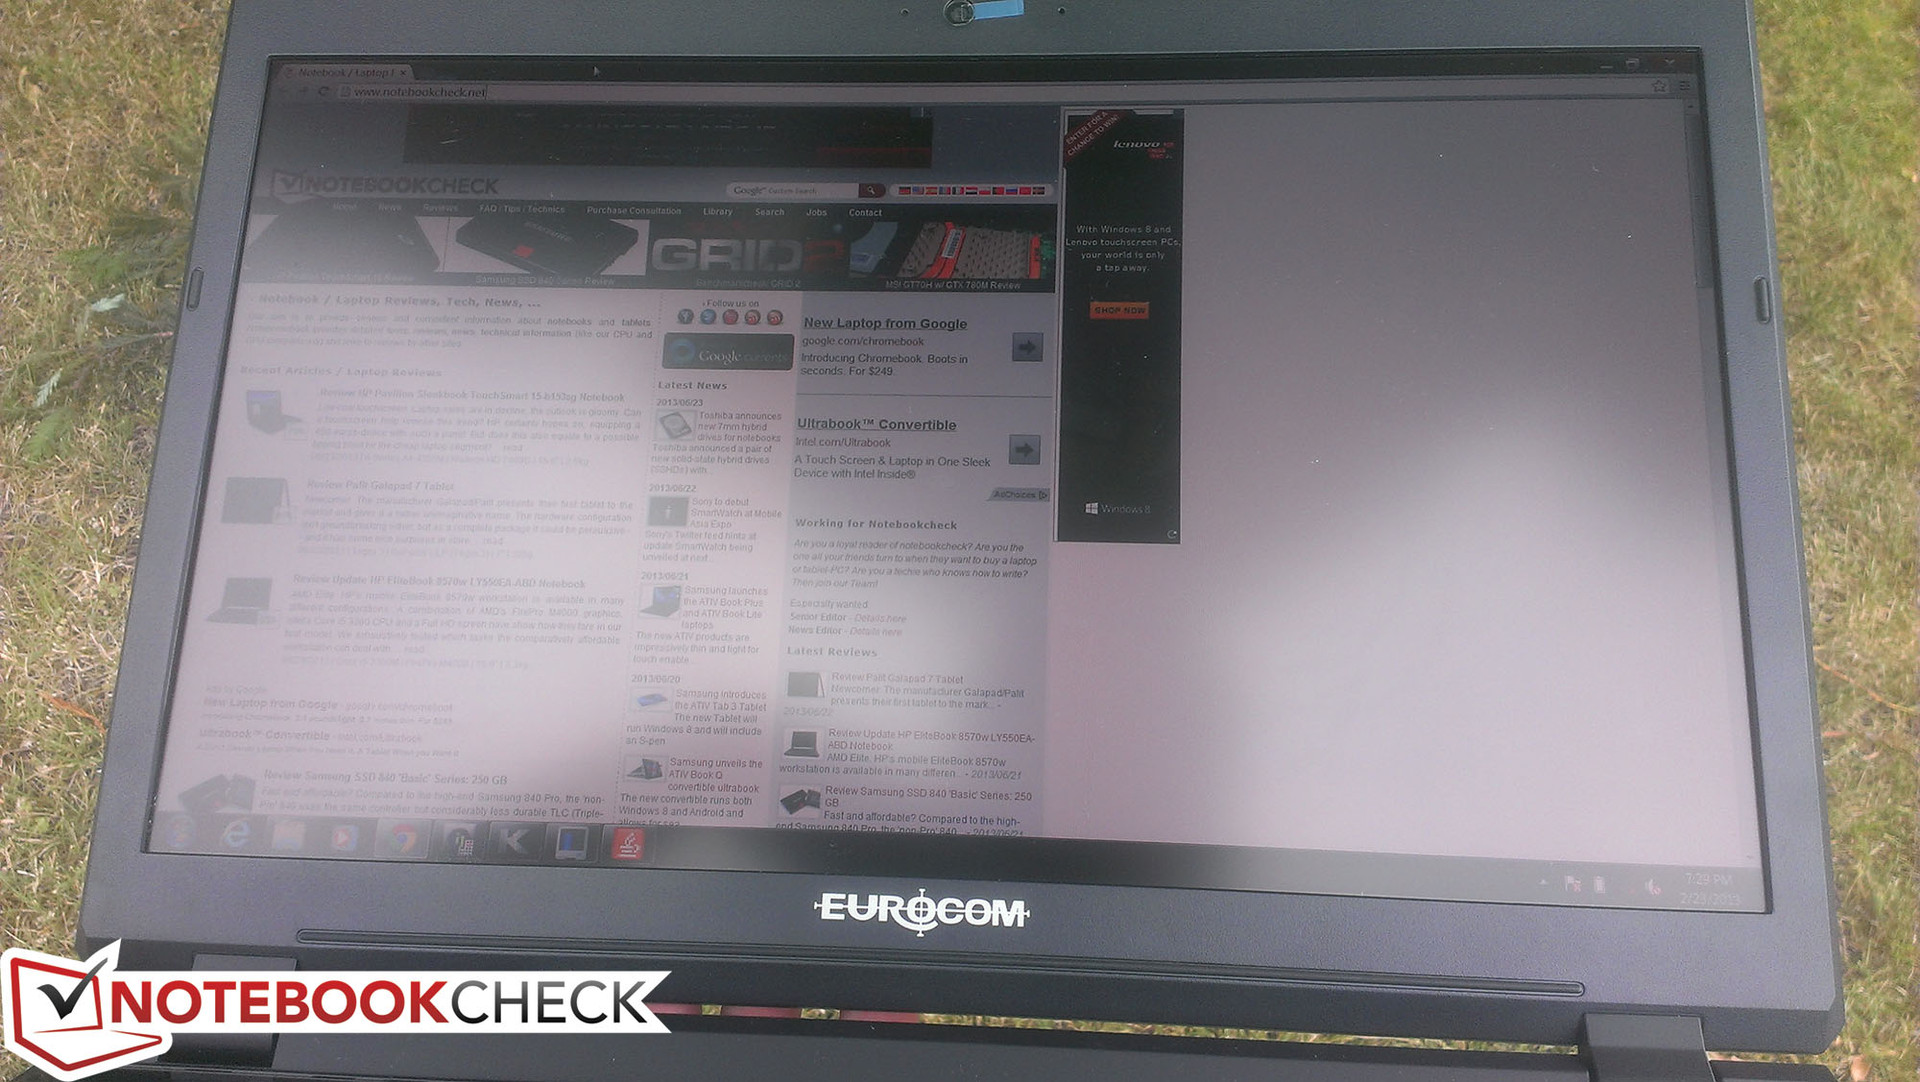 EUROCOM X3(蓝天P157SM)笔记本测评 - Notebookcheck